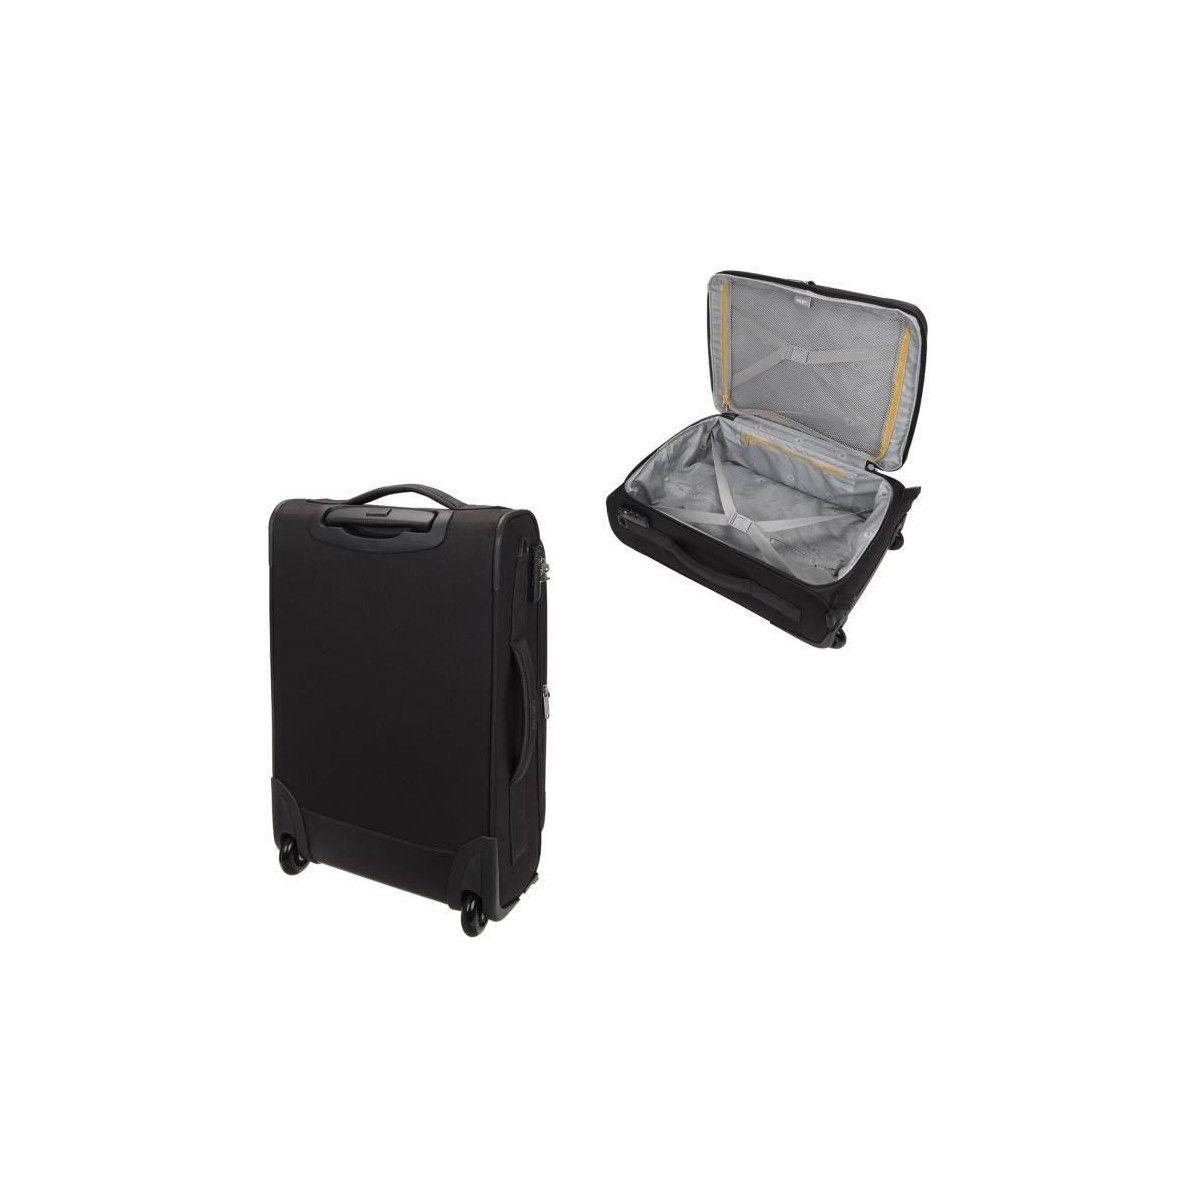 fb1dd81fab ... VISA DELSEY Valise Cabine Low Cost Extensible Souple 2 Roues 55cm PIN  UP5 Noir ...